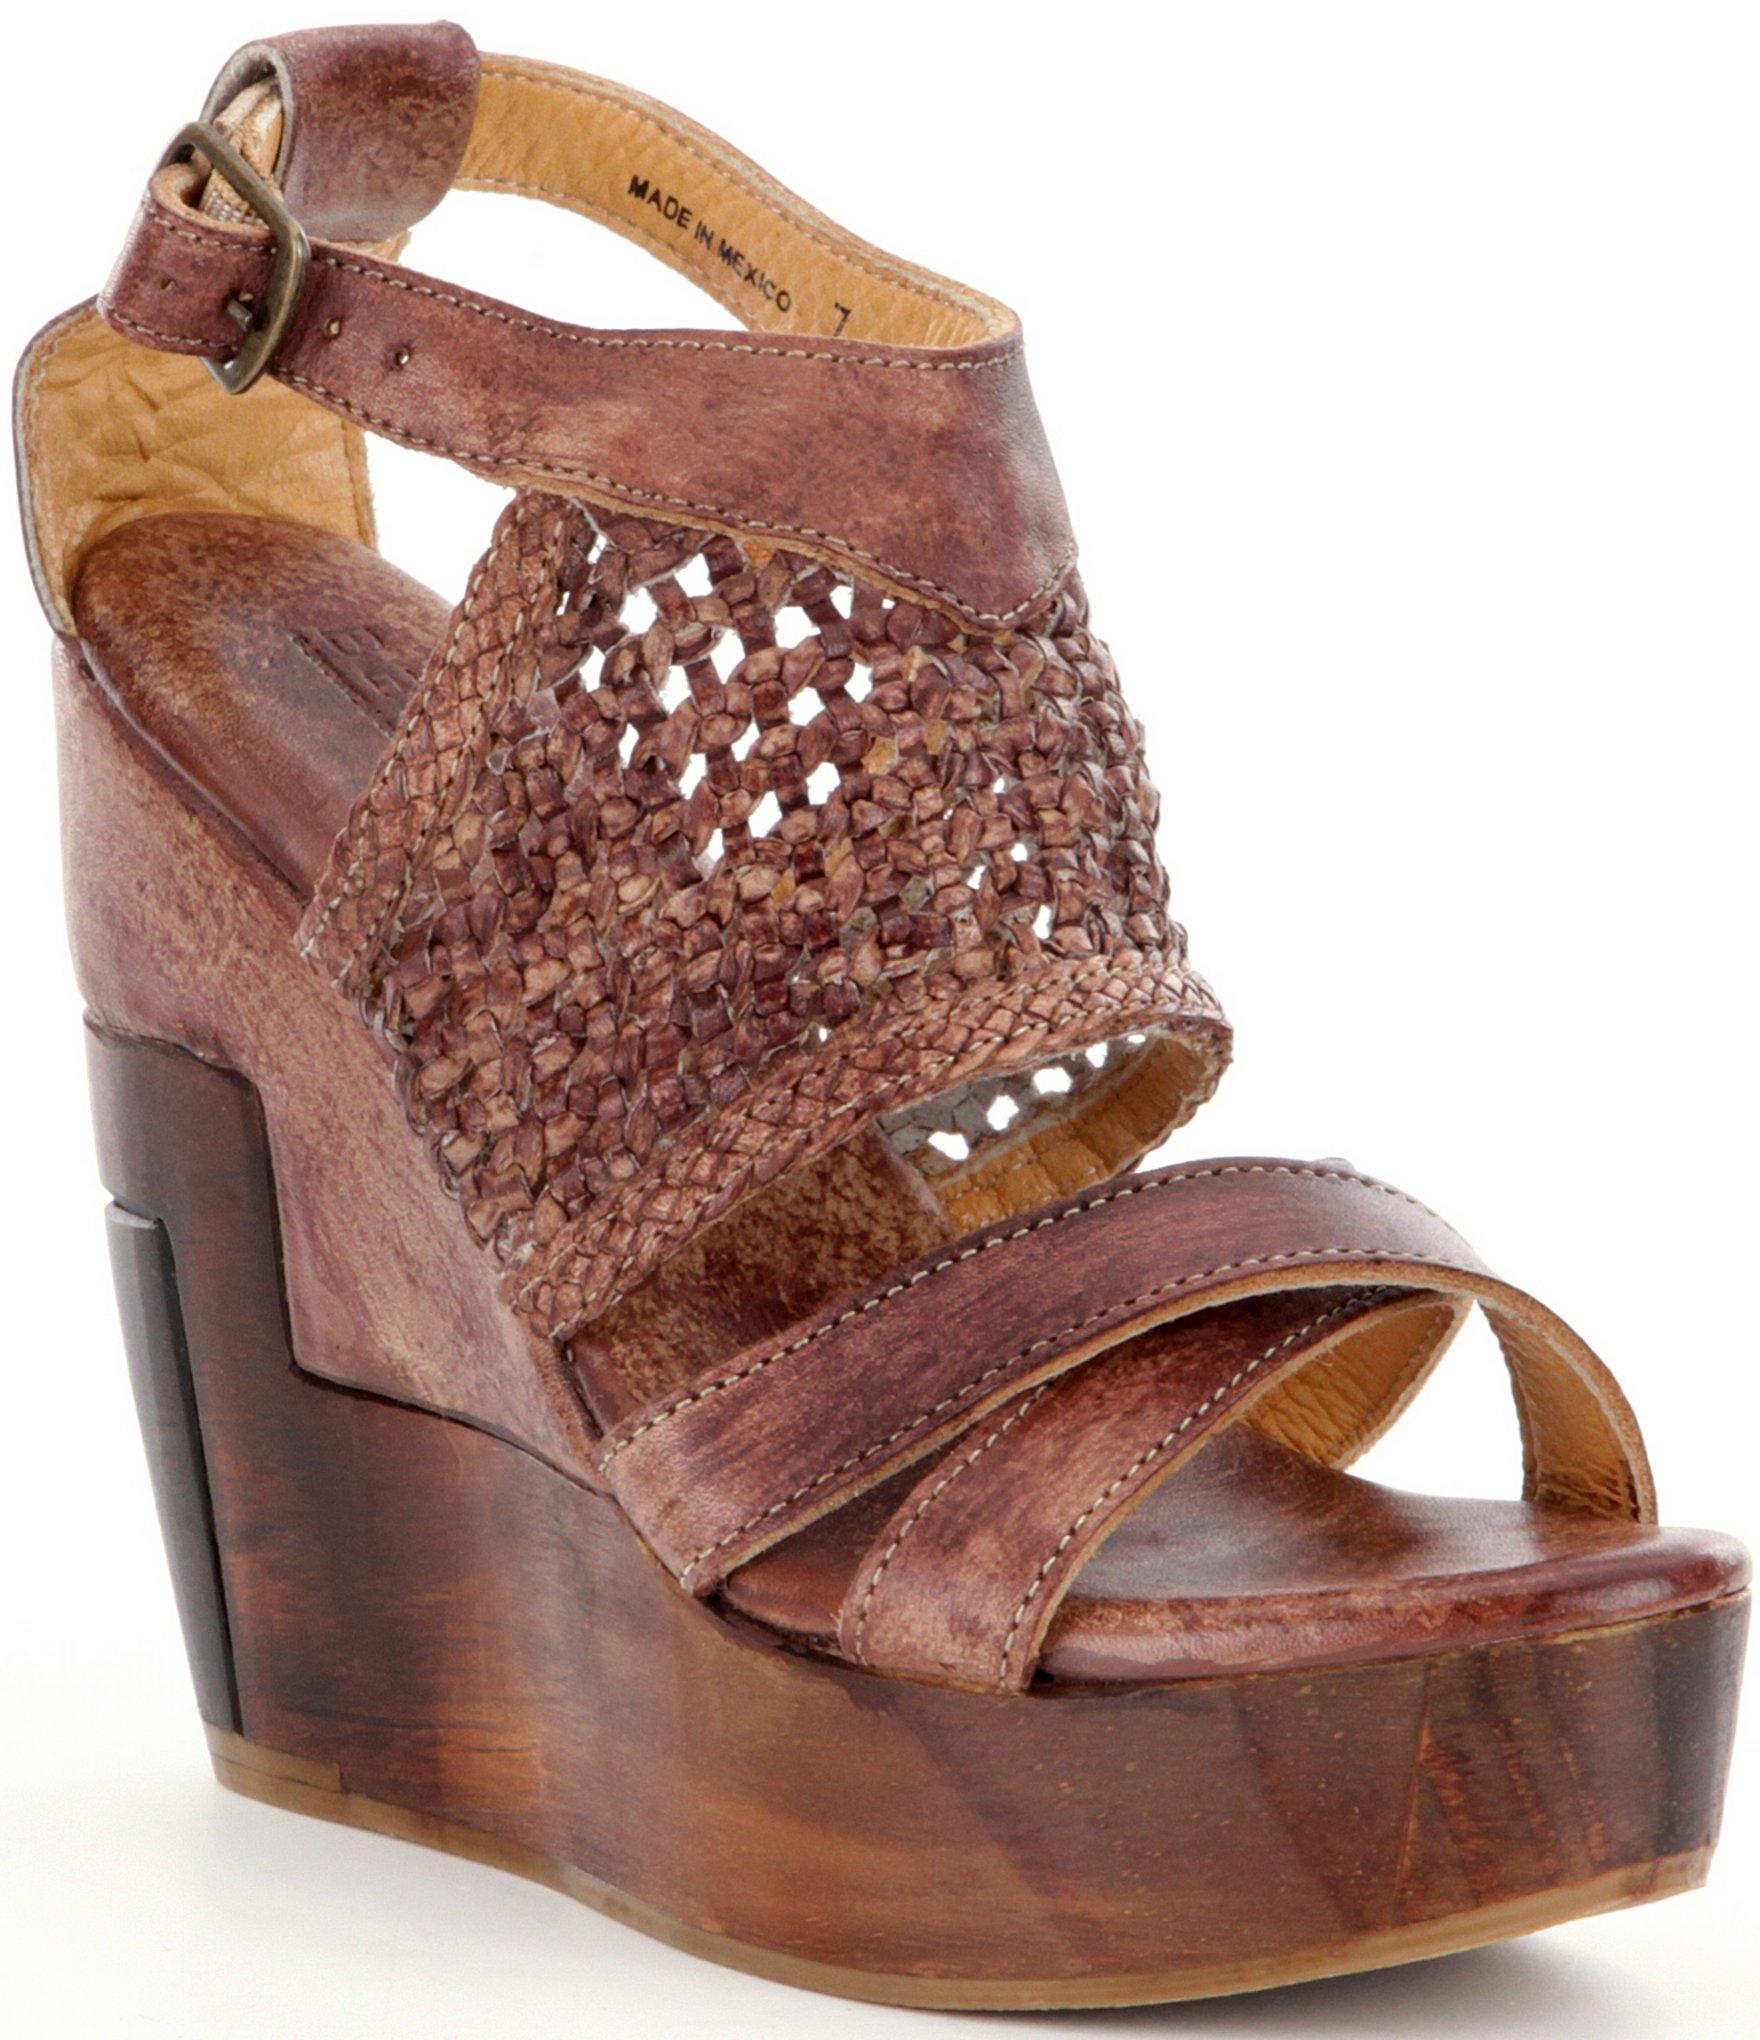 01b5d931cf1 Lyst - Bed Stu Petra Wedge Sandals in Brown